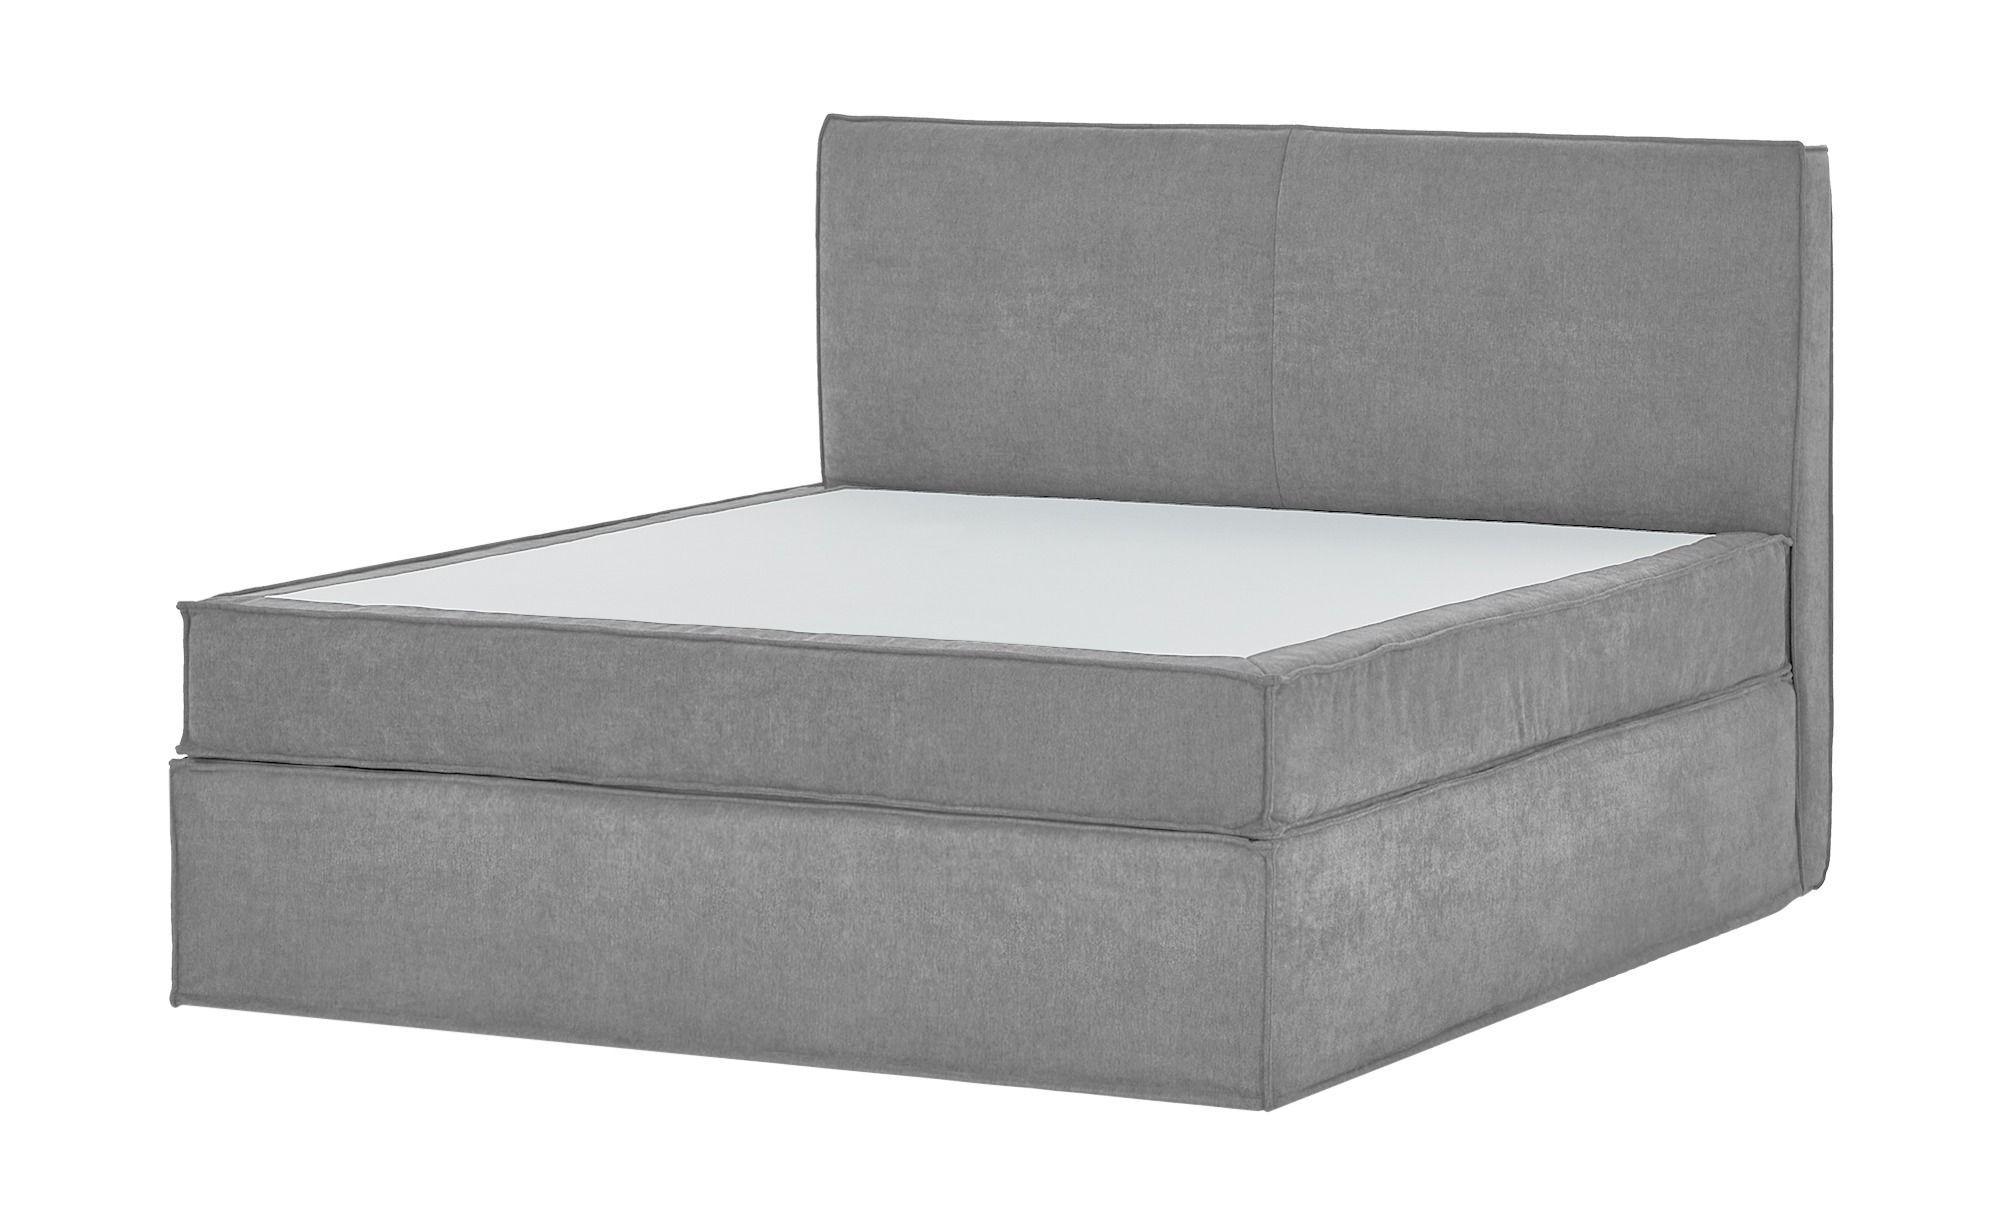 Boxi Urban Box Spring Bed Found At Mobel Hoffner Boxi Box